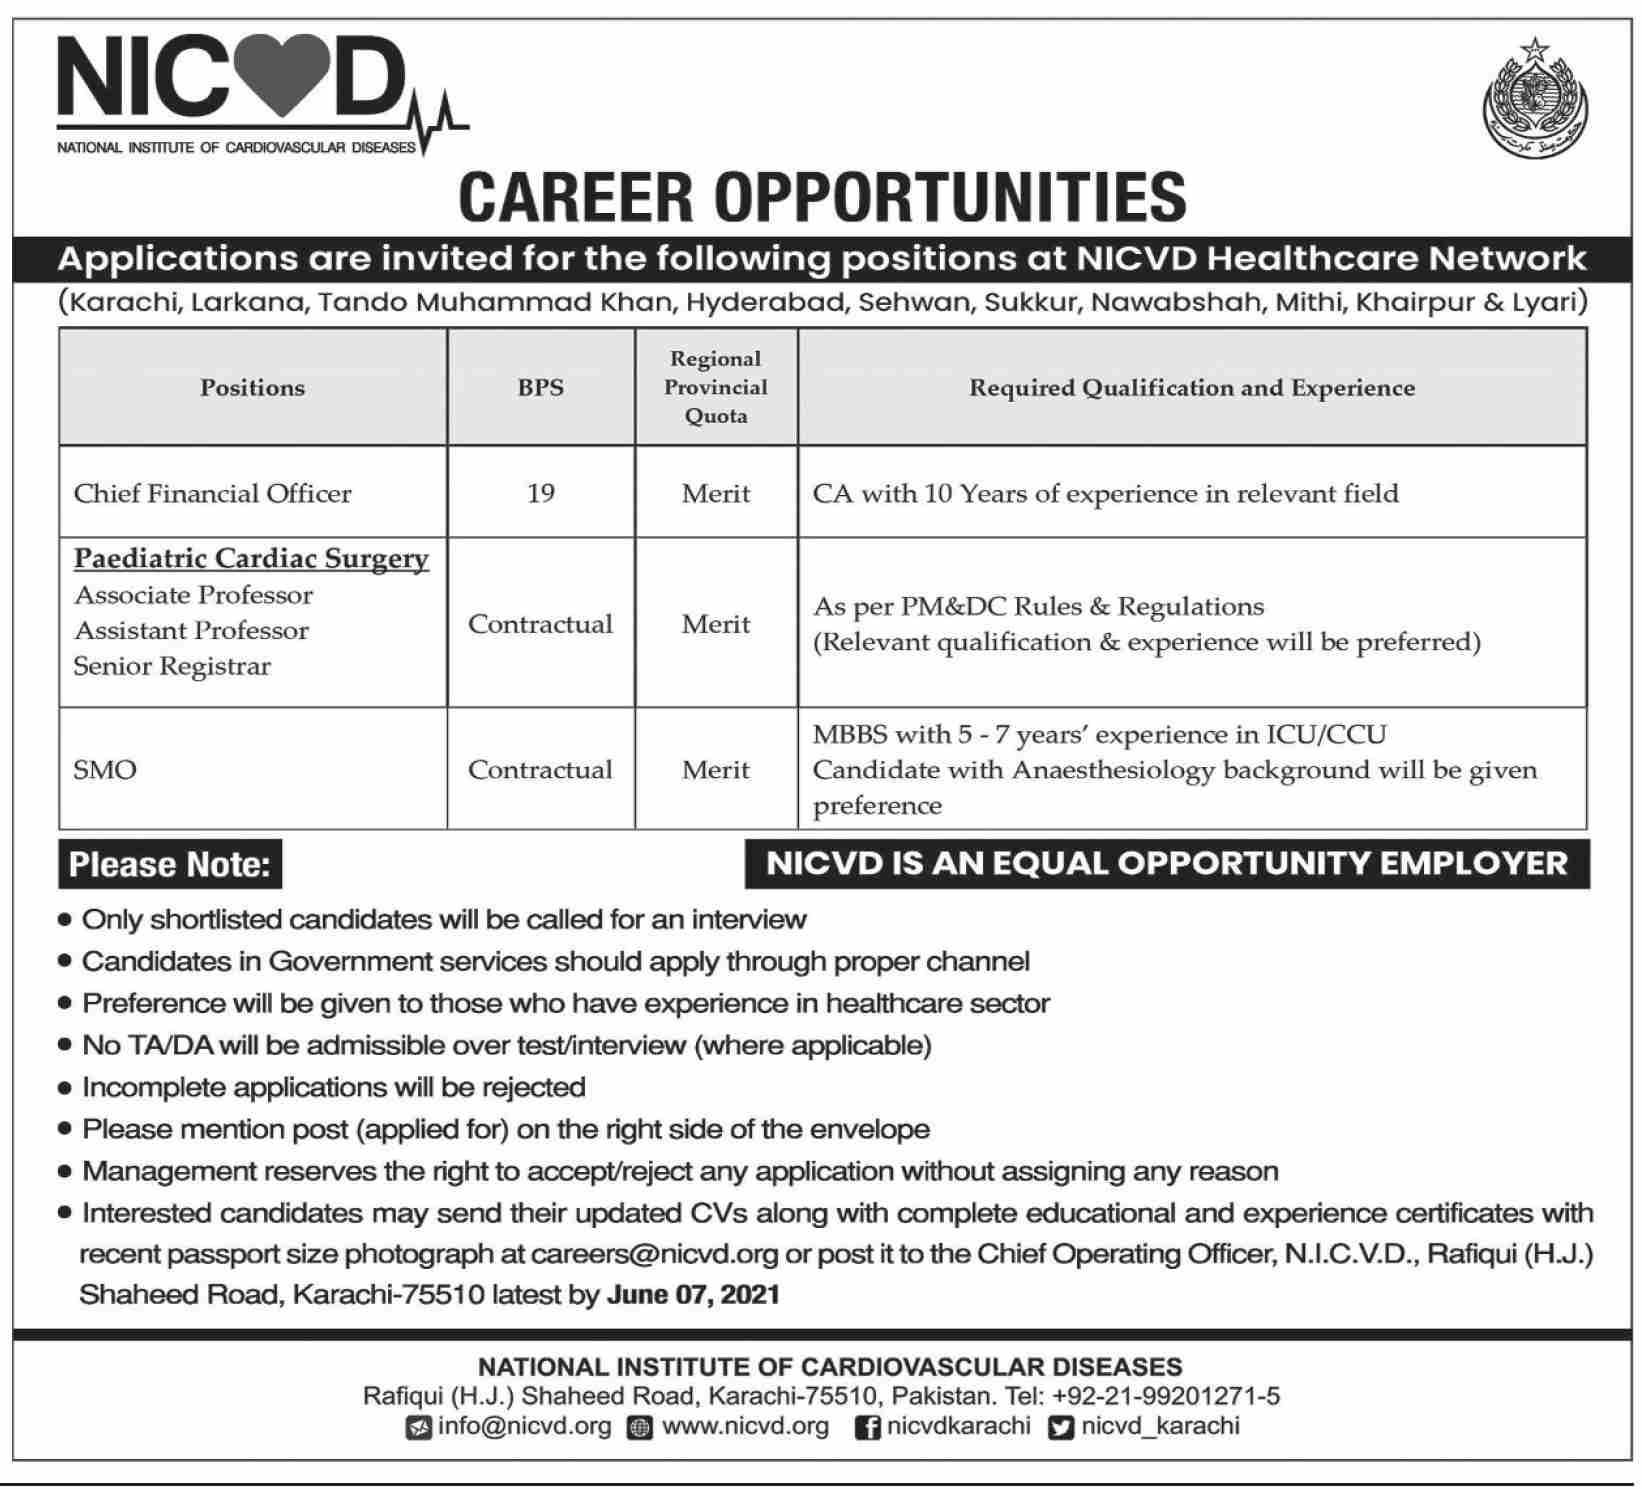 National Institute of Cardiovascular Diseases (NICVD) Jobs 2021 in Pakistan